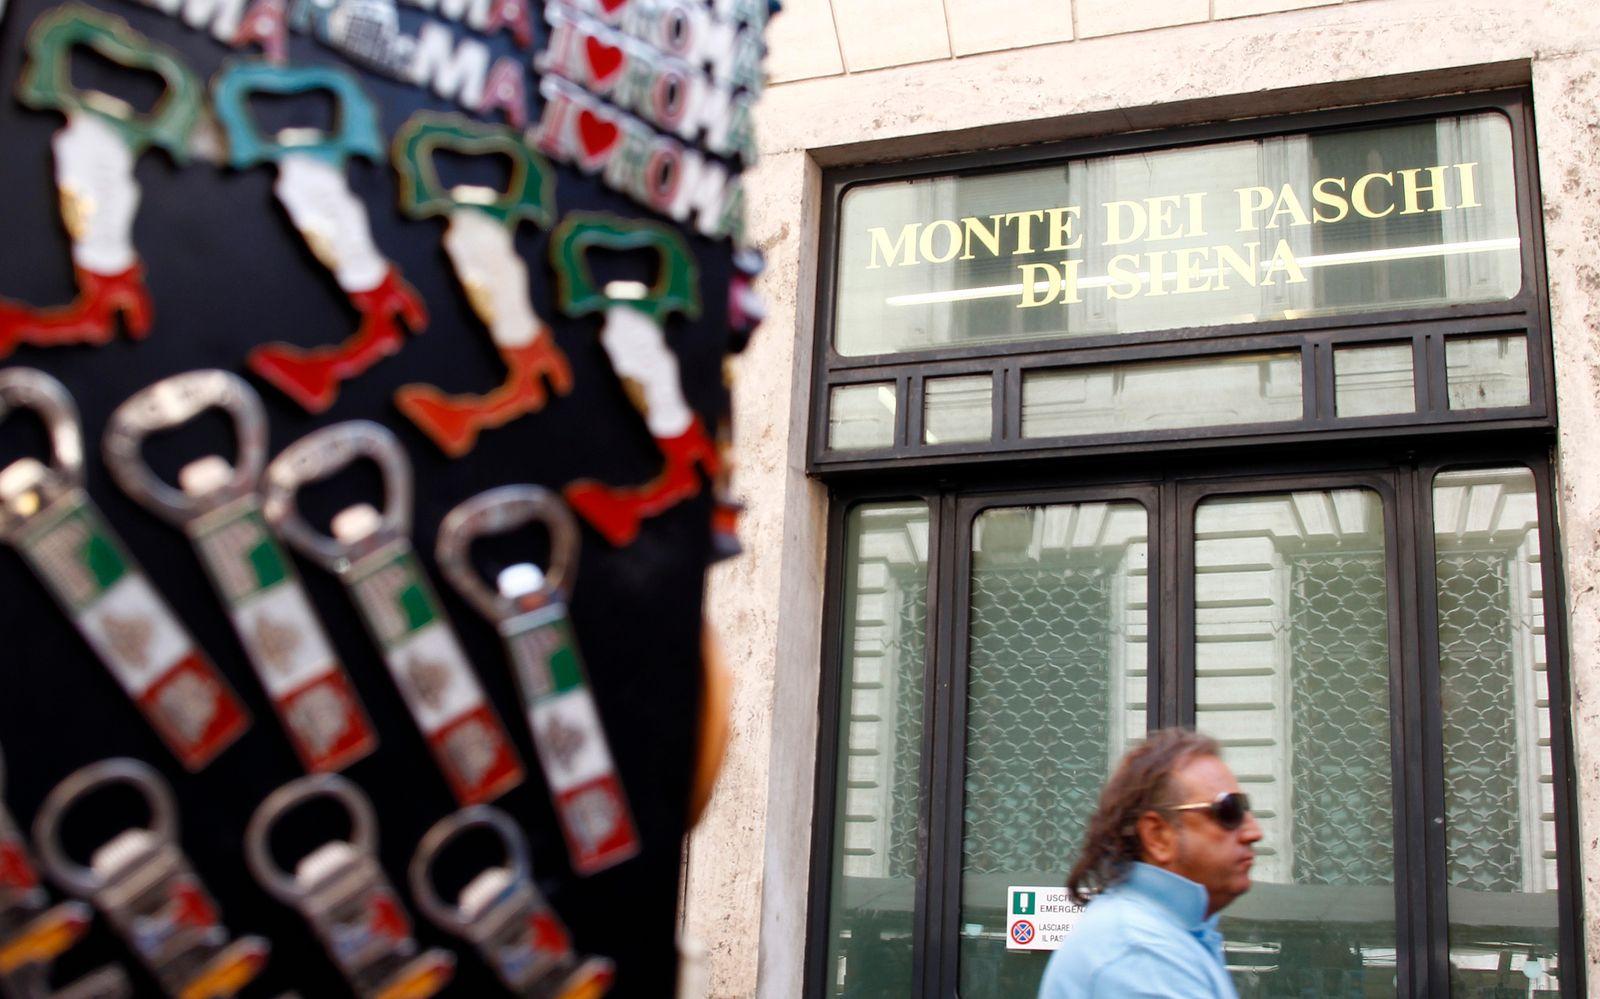 Italien / Bank / Paschi di Siena